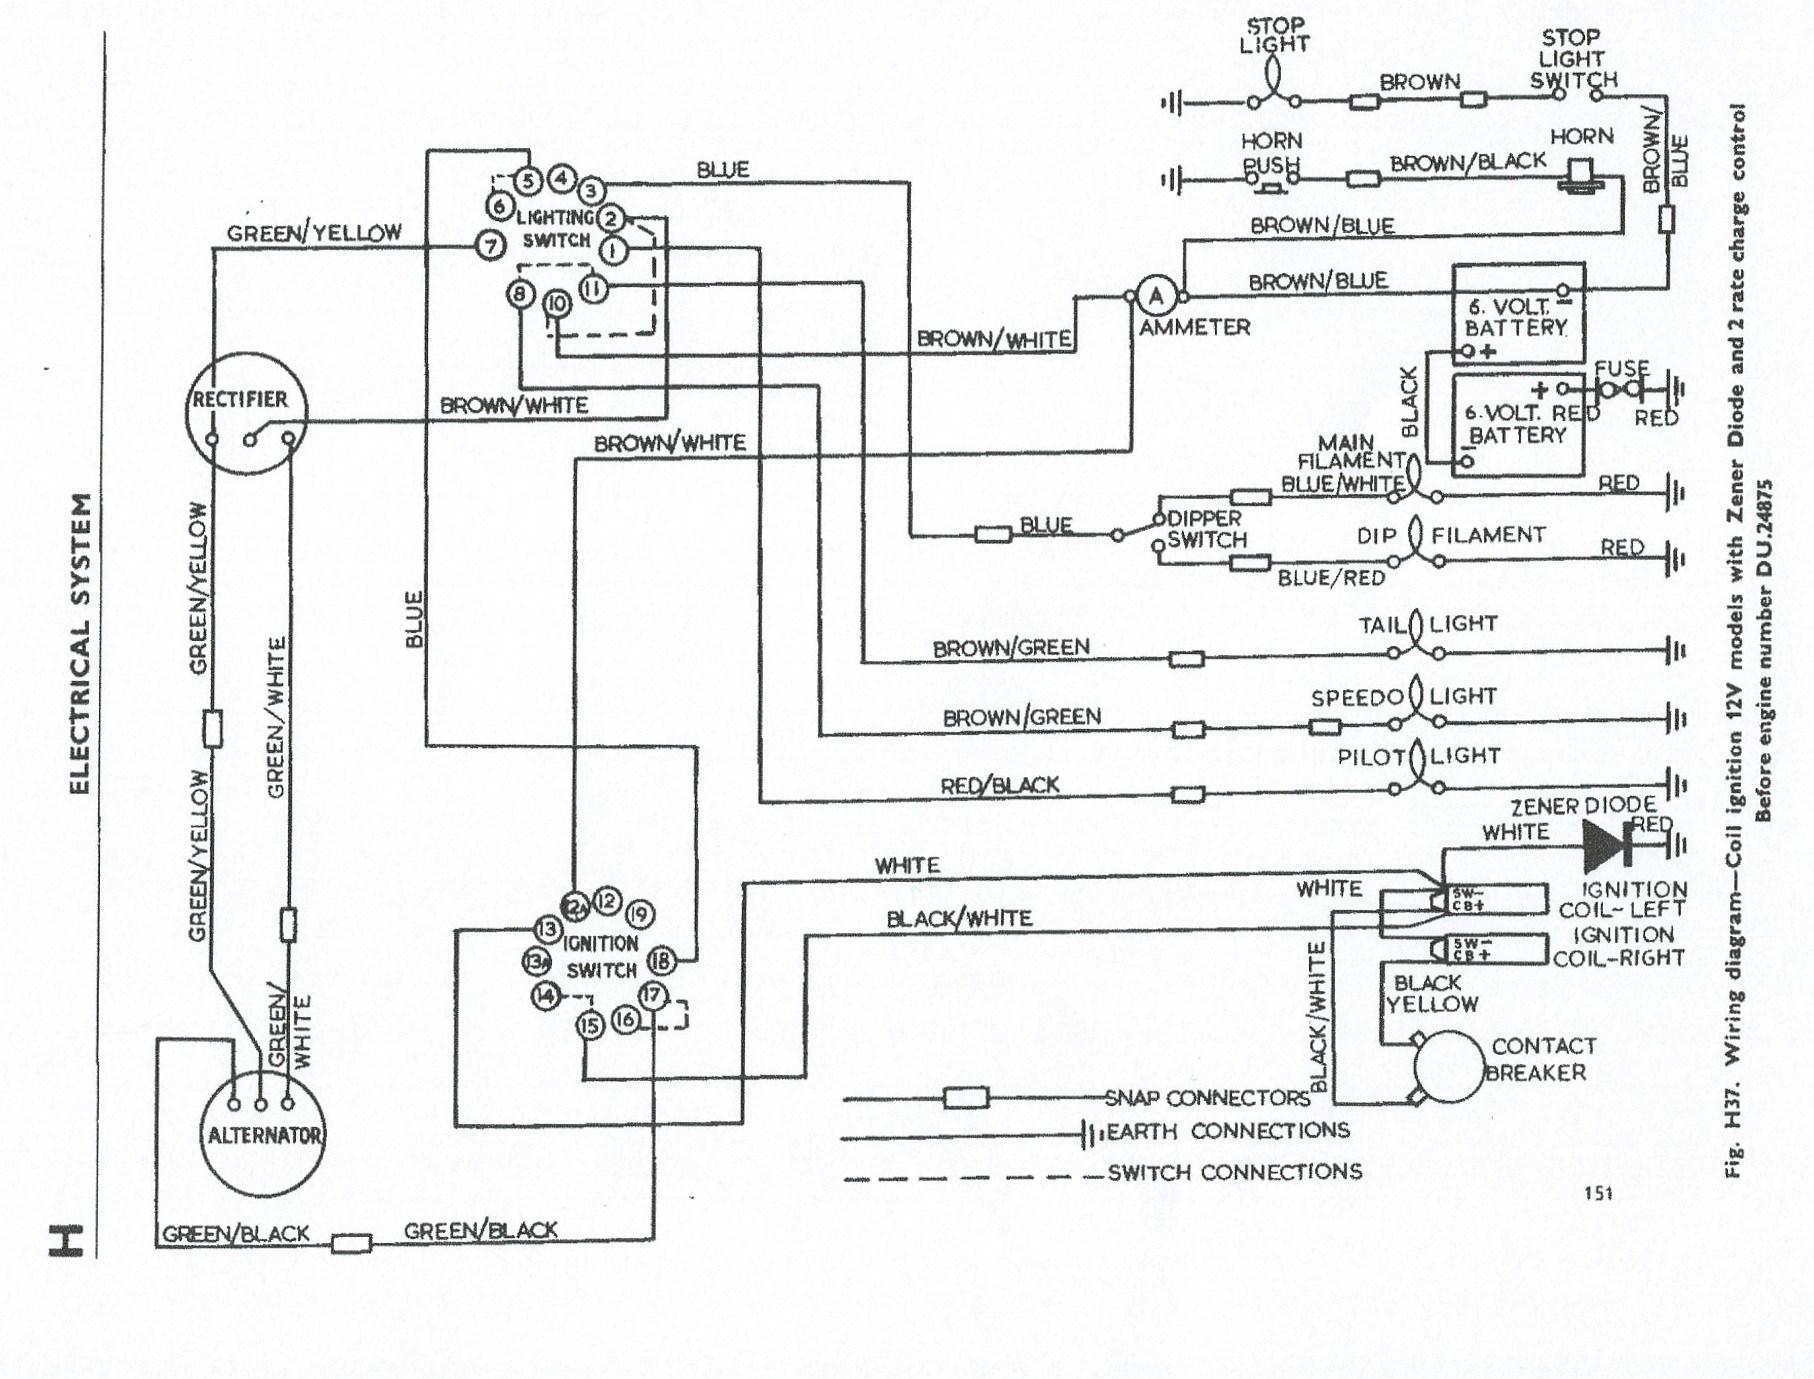 sparx wiring diagram for lights ts 2156  eliminator wiring diagram as well triumph chopper wiring  triumph chopper wiring